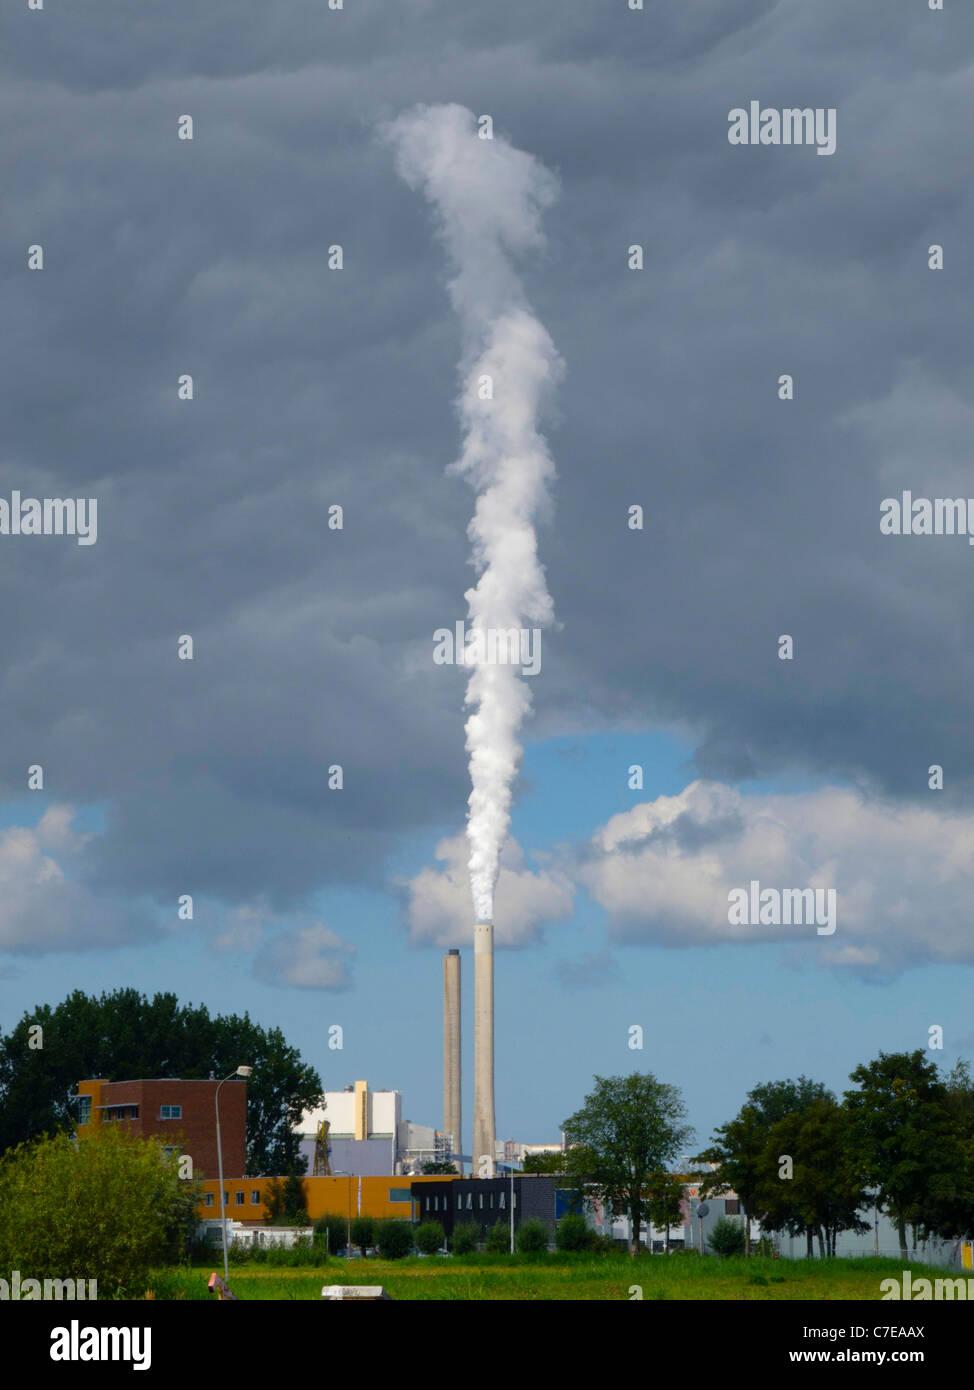 Smoke, steam from Hemweg Centrale, the main powerplant from Amsterdam. - Stock Image